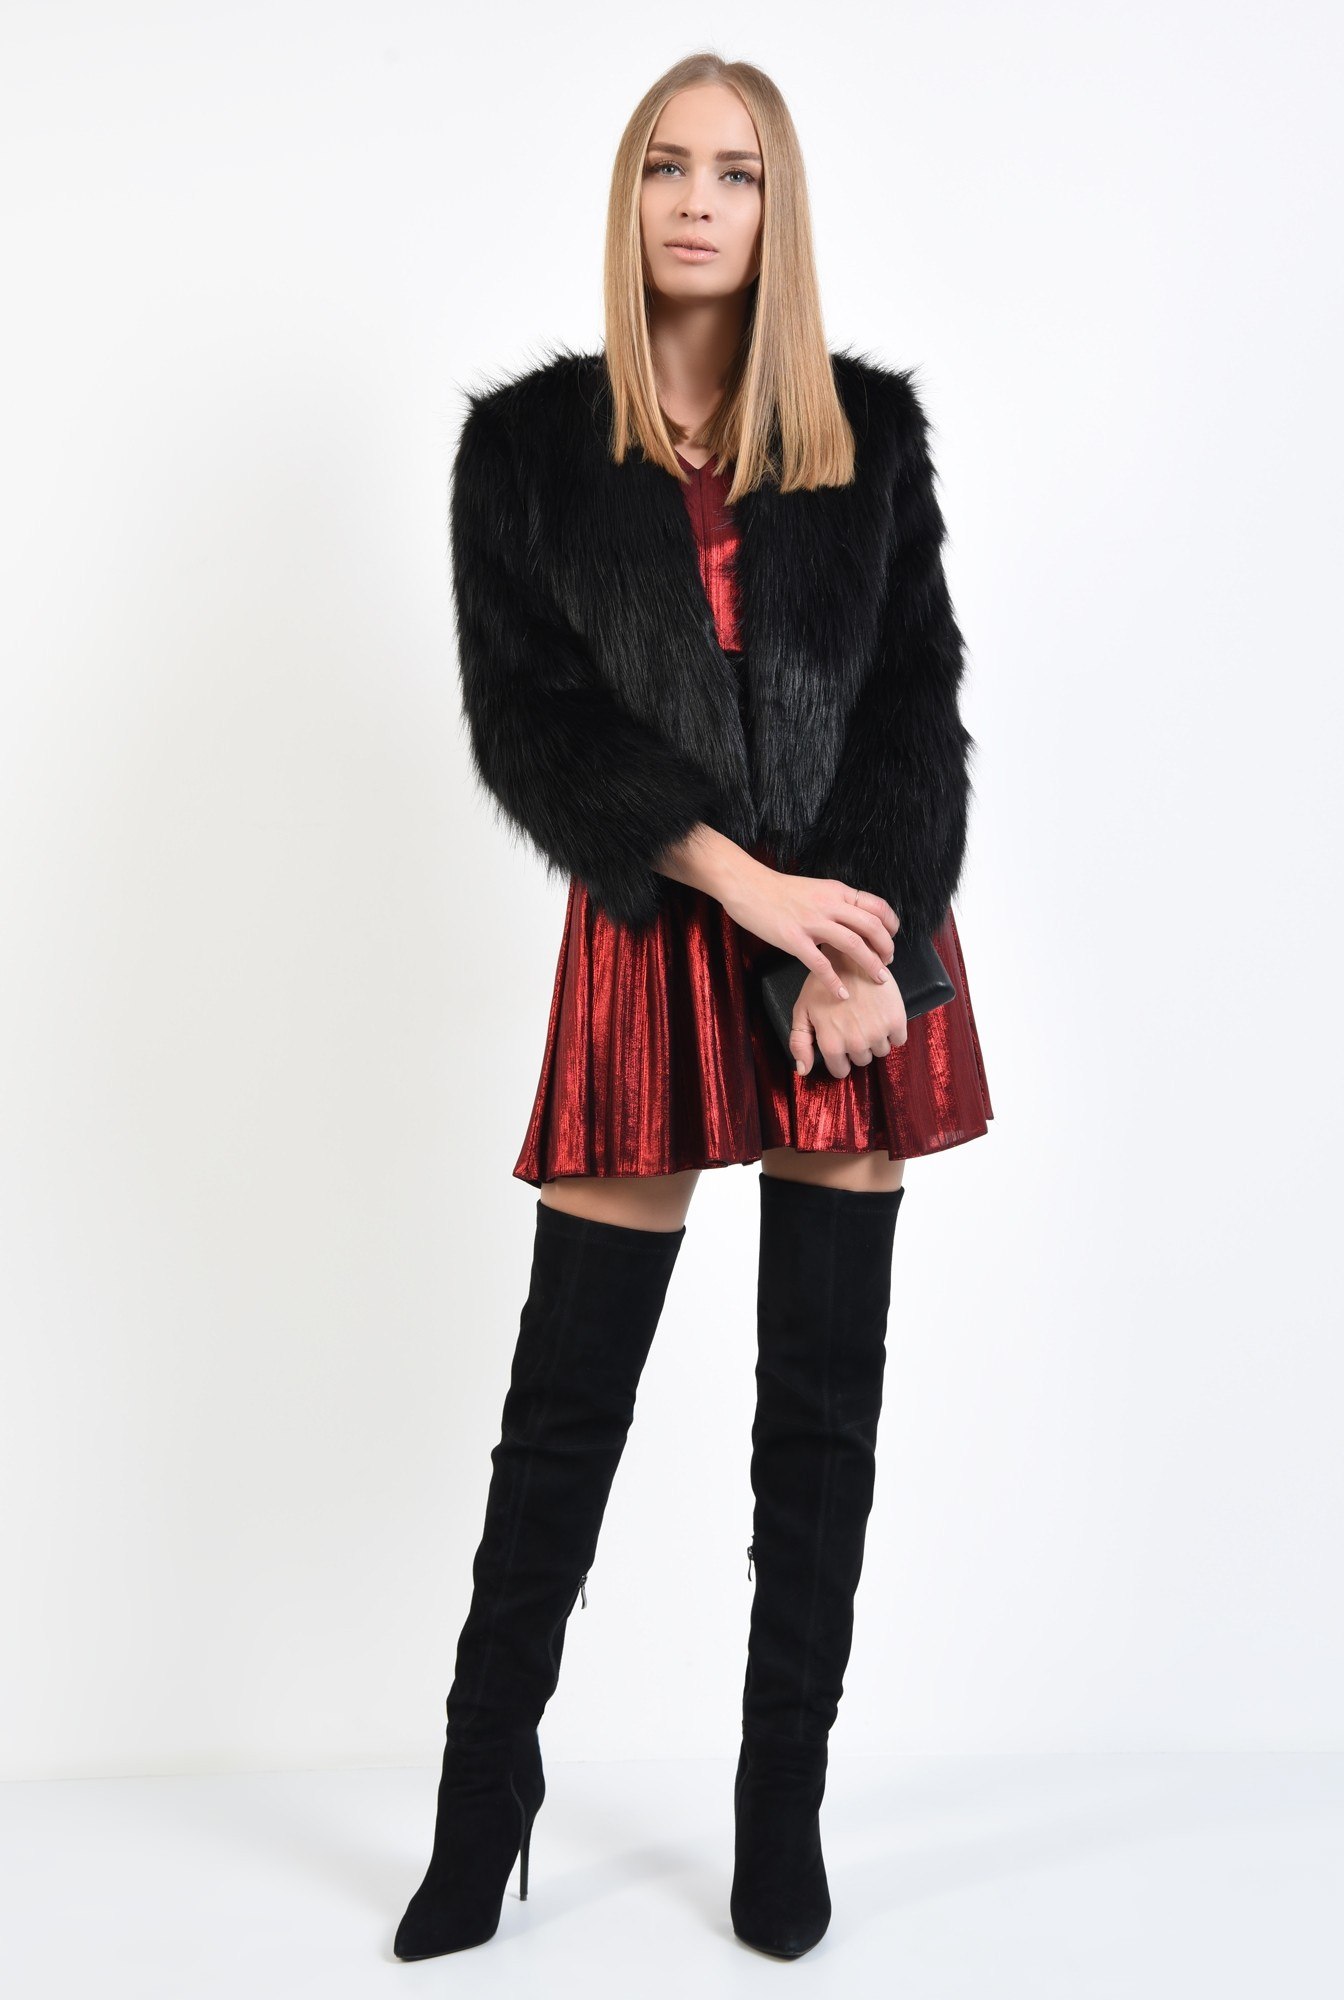 3 - haina de blana, neagra, jacheta dama, bolero blana online